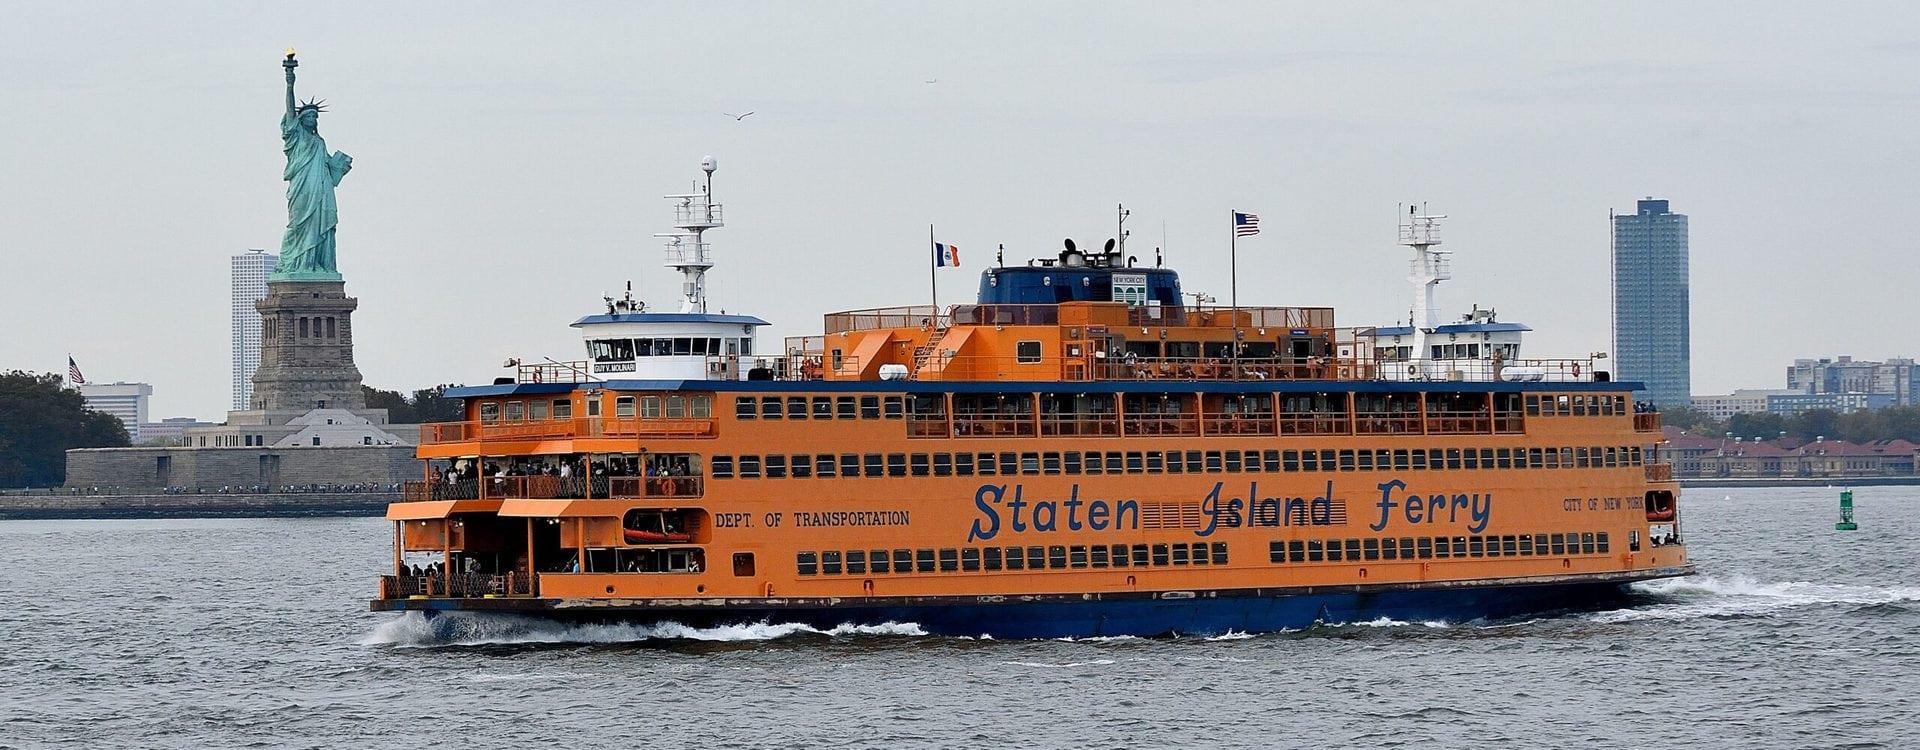 Studietur New York Staten Island Ferry